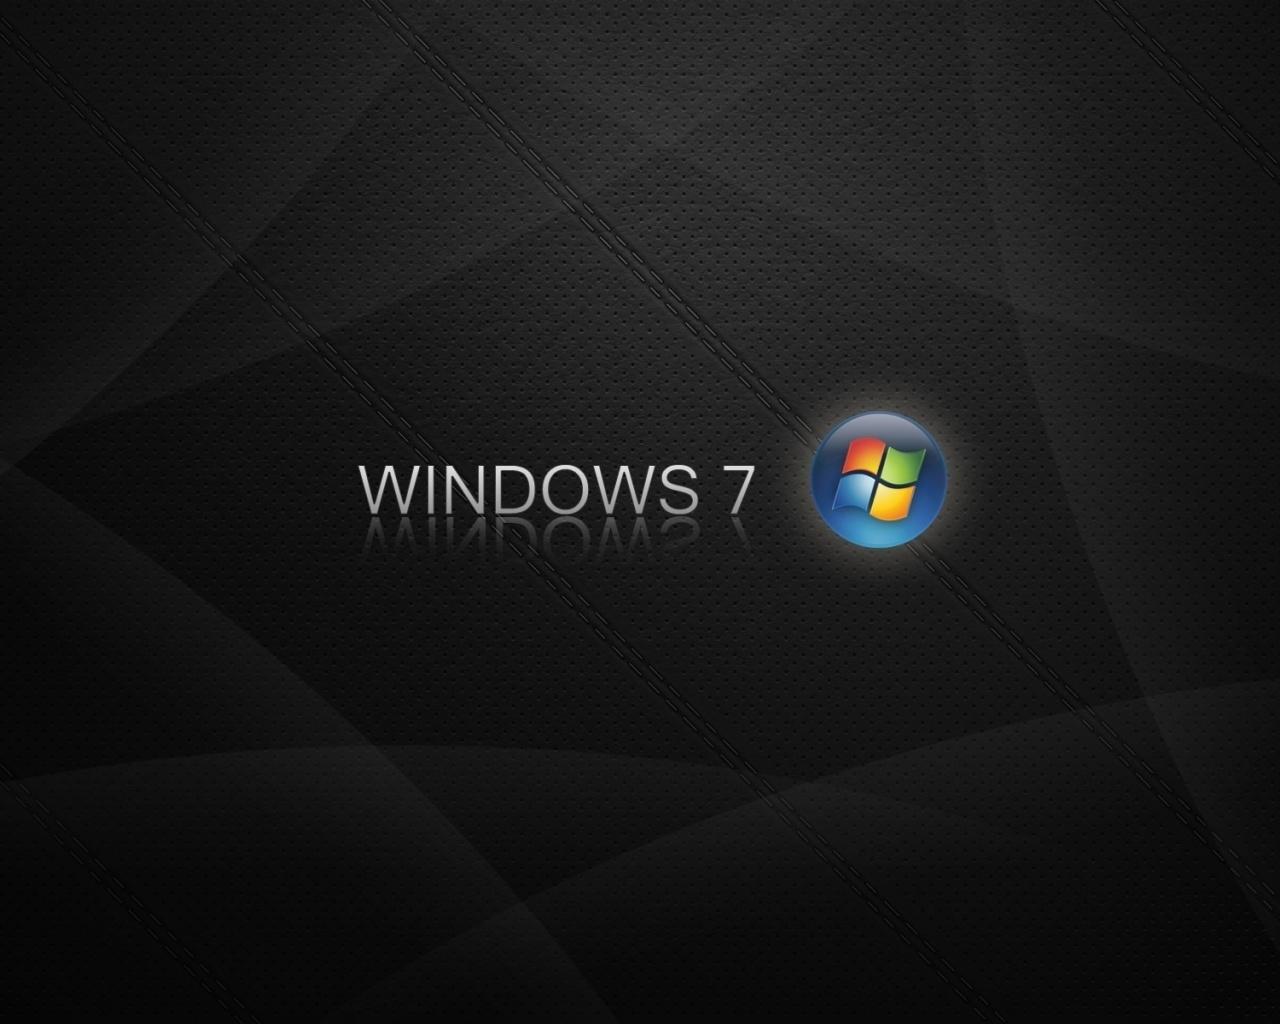 1280x1024 Windows 7 desktop PC and Mac wallpaper 1280x1024